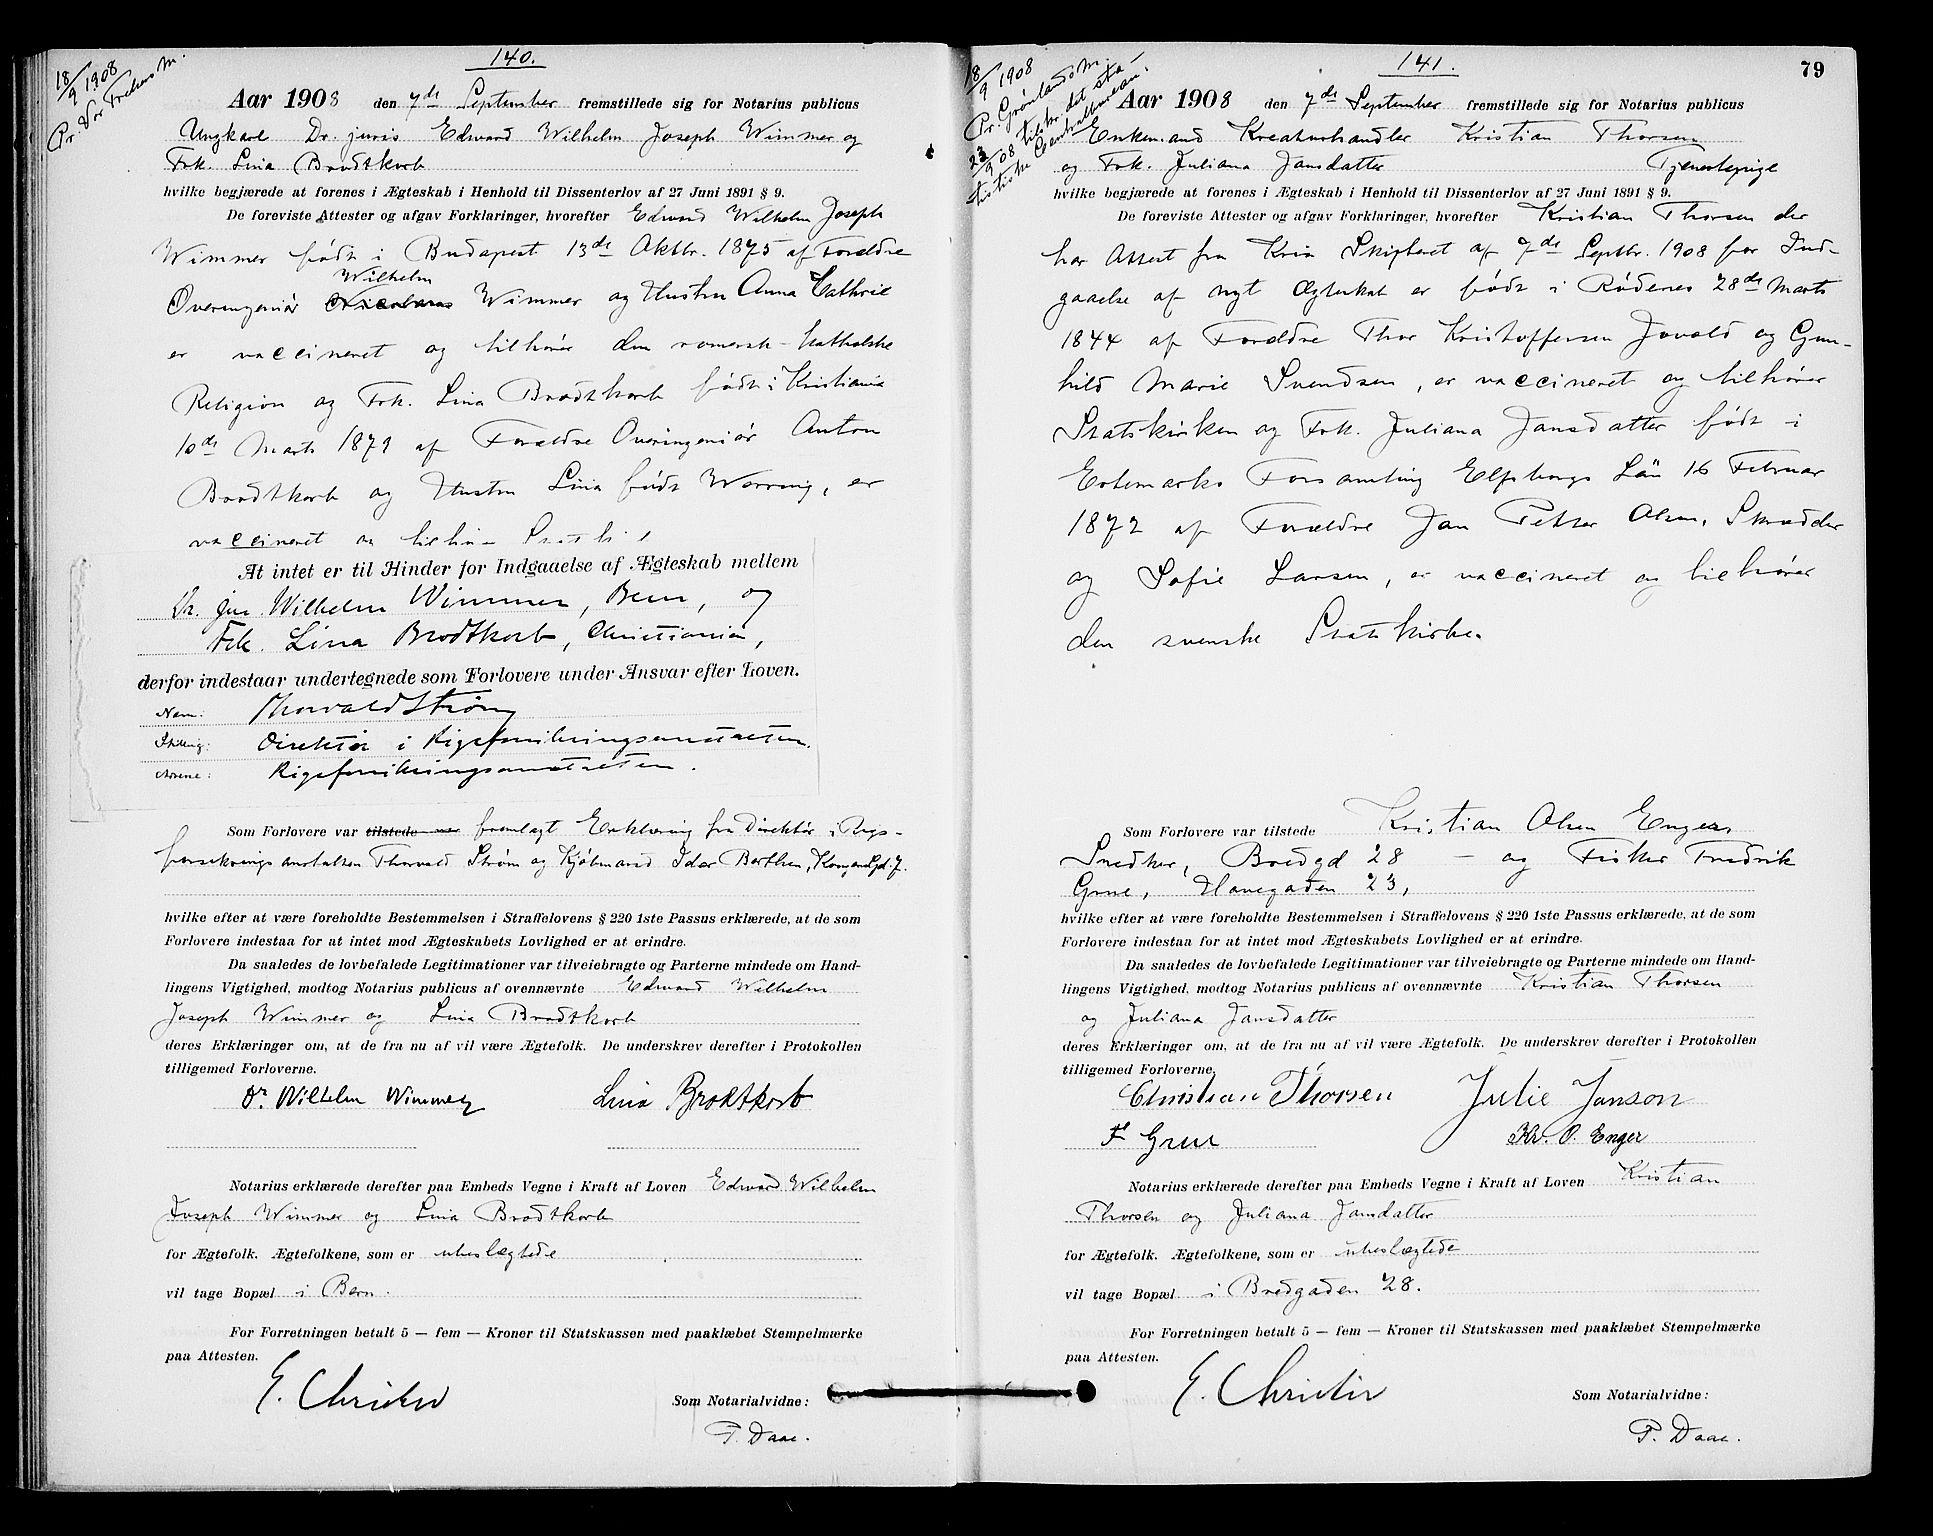 SAO, Oslo byfogd avd. I, L/Lb/Lbb/L0007: Notarialprotokoll, rekke II: Vigsler, 1907-1911, s. 78b-79a